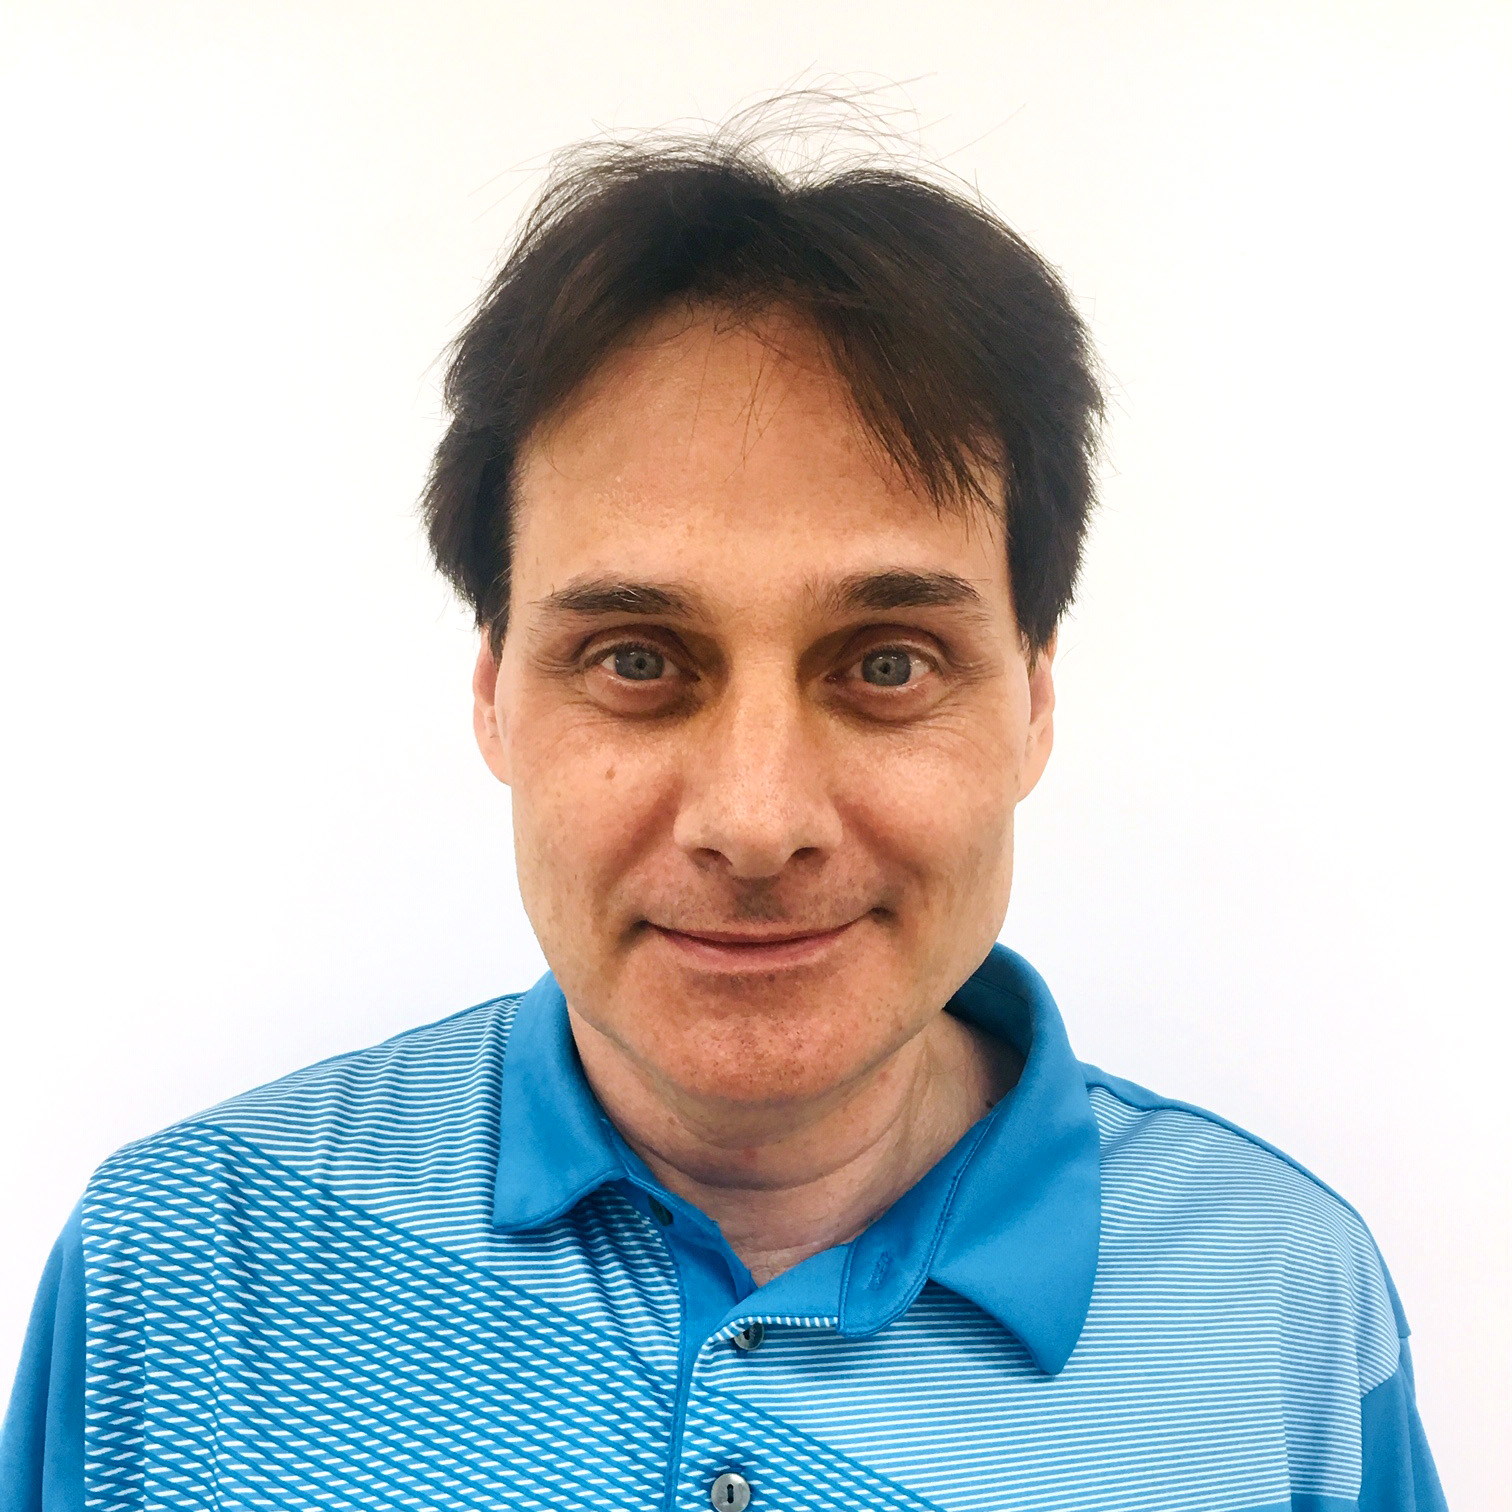 Chess - Mr. Goran Prpic